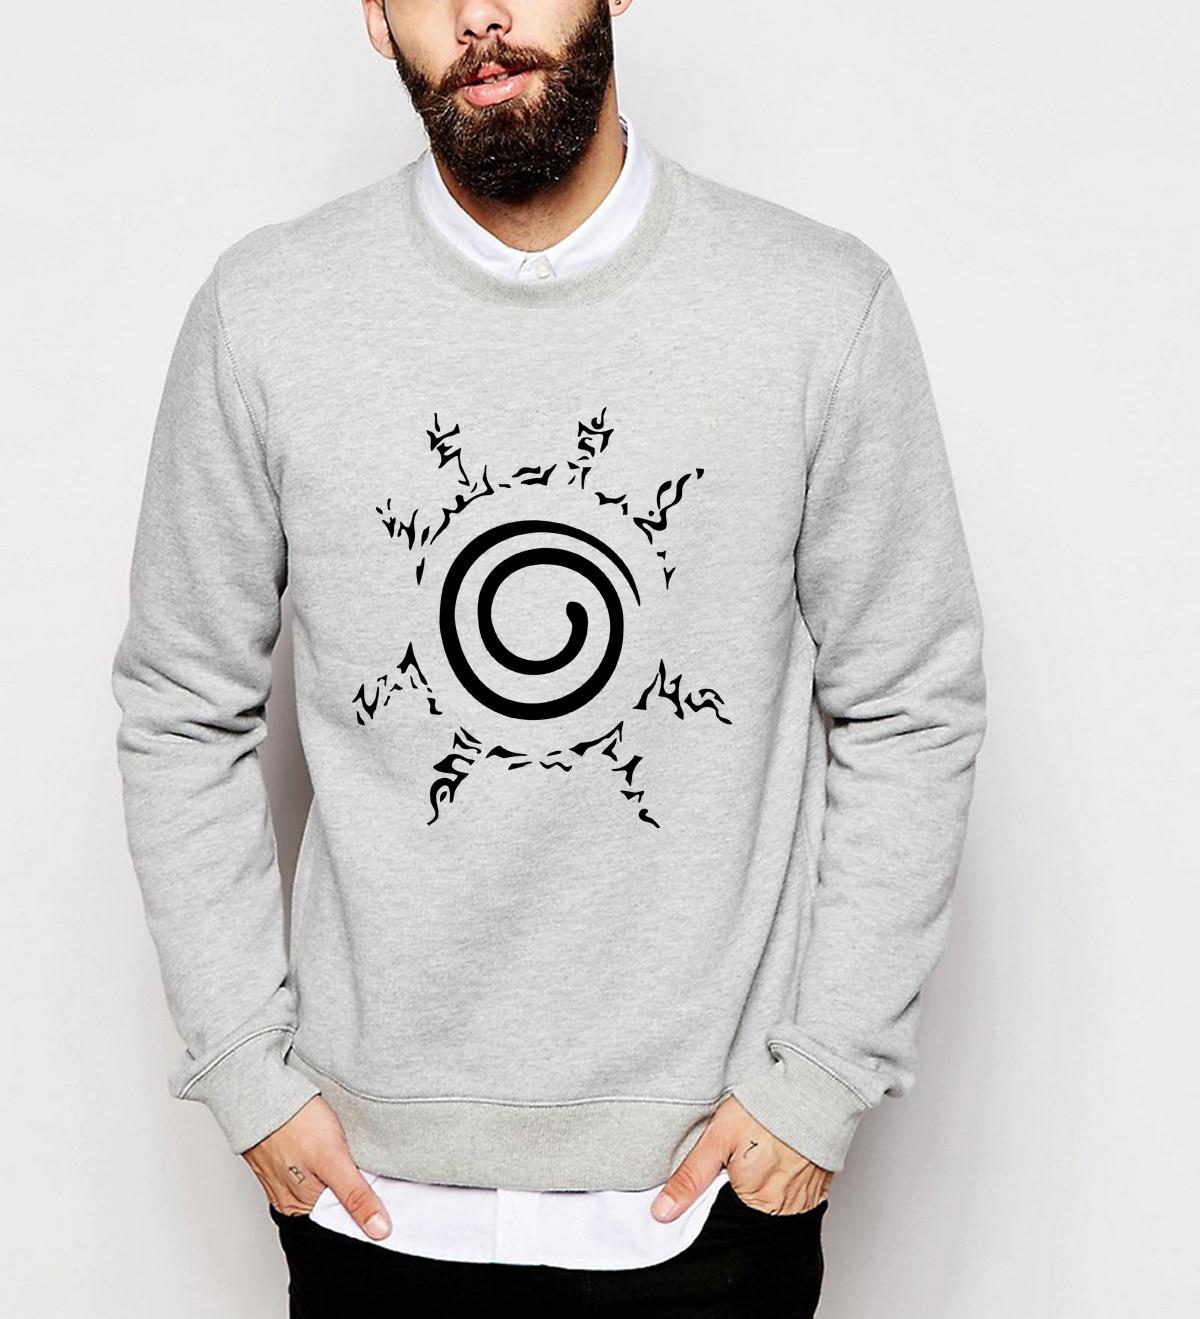 newest long sleeve printed men sweatshirts 2019 fall winter fashion Uzumaki Naruto hoodies fleece top brand clothing tracksuit